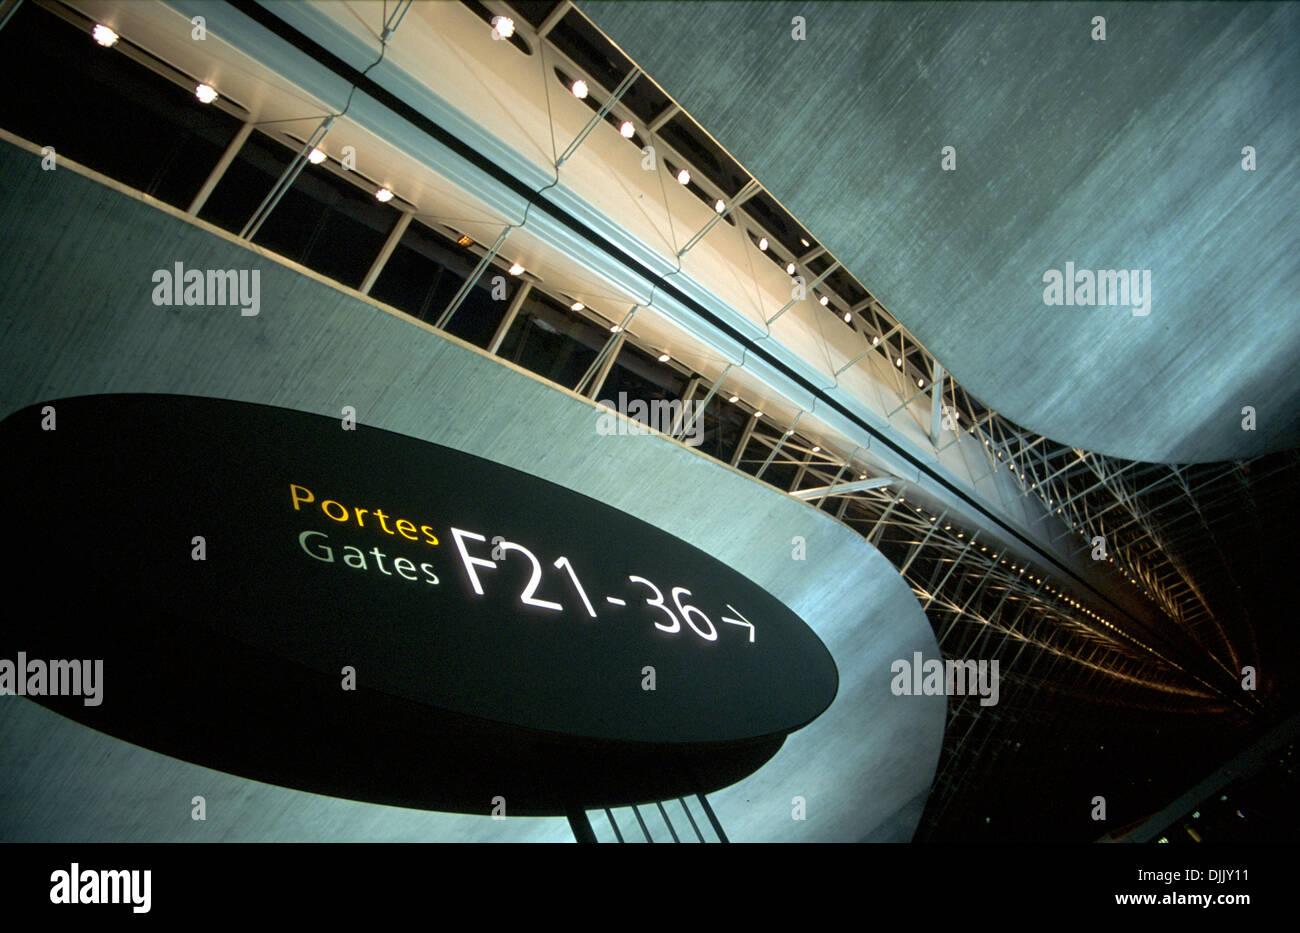 gates-f21-to-f36-in-paris-cdg-terminal-2f-having-a-concorde-shape-DJJY11.jpg